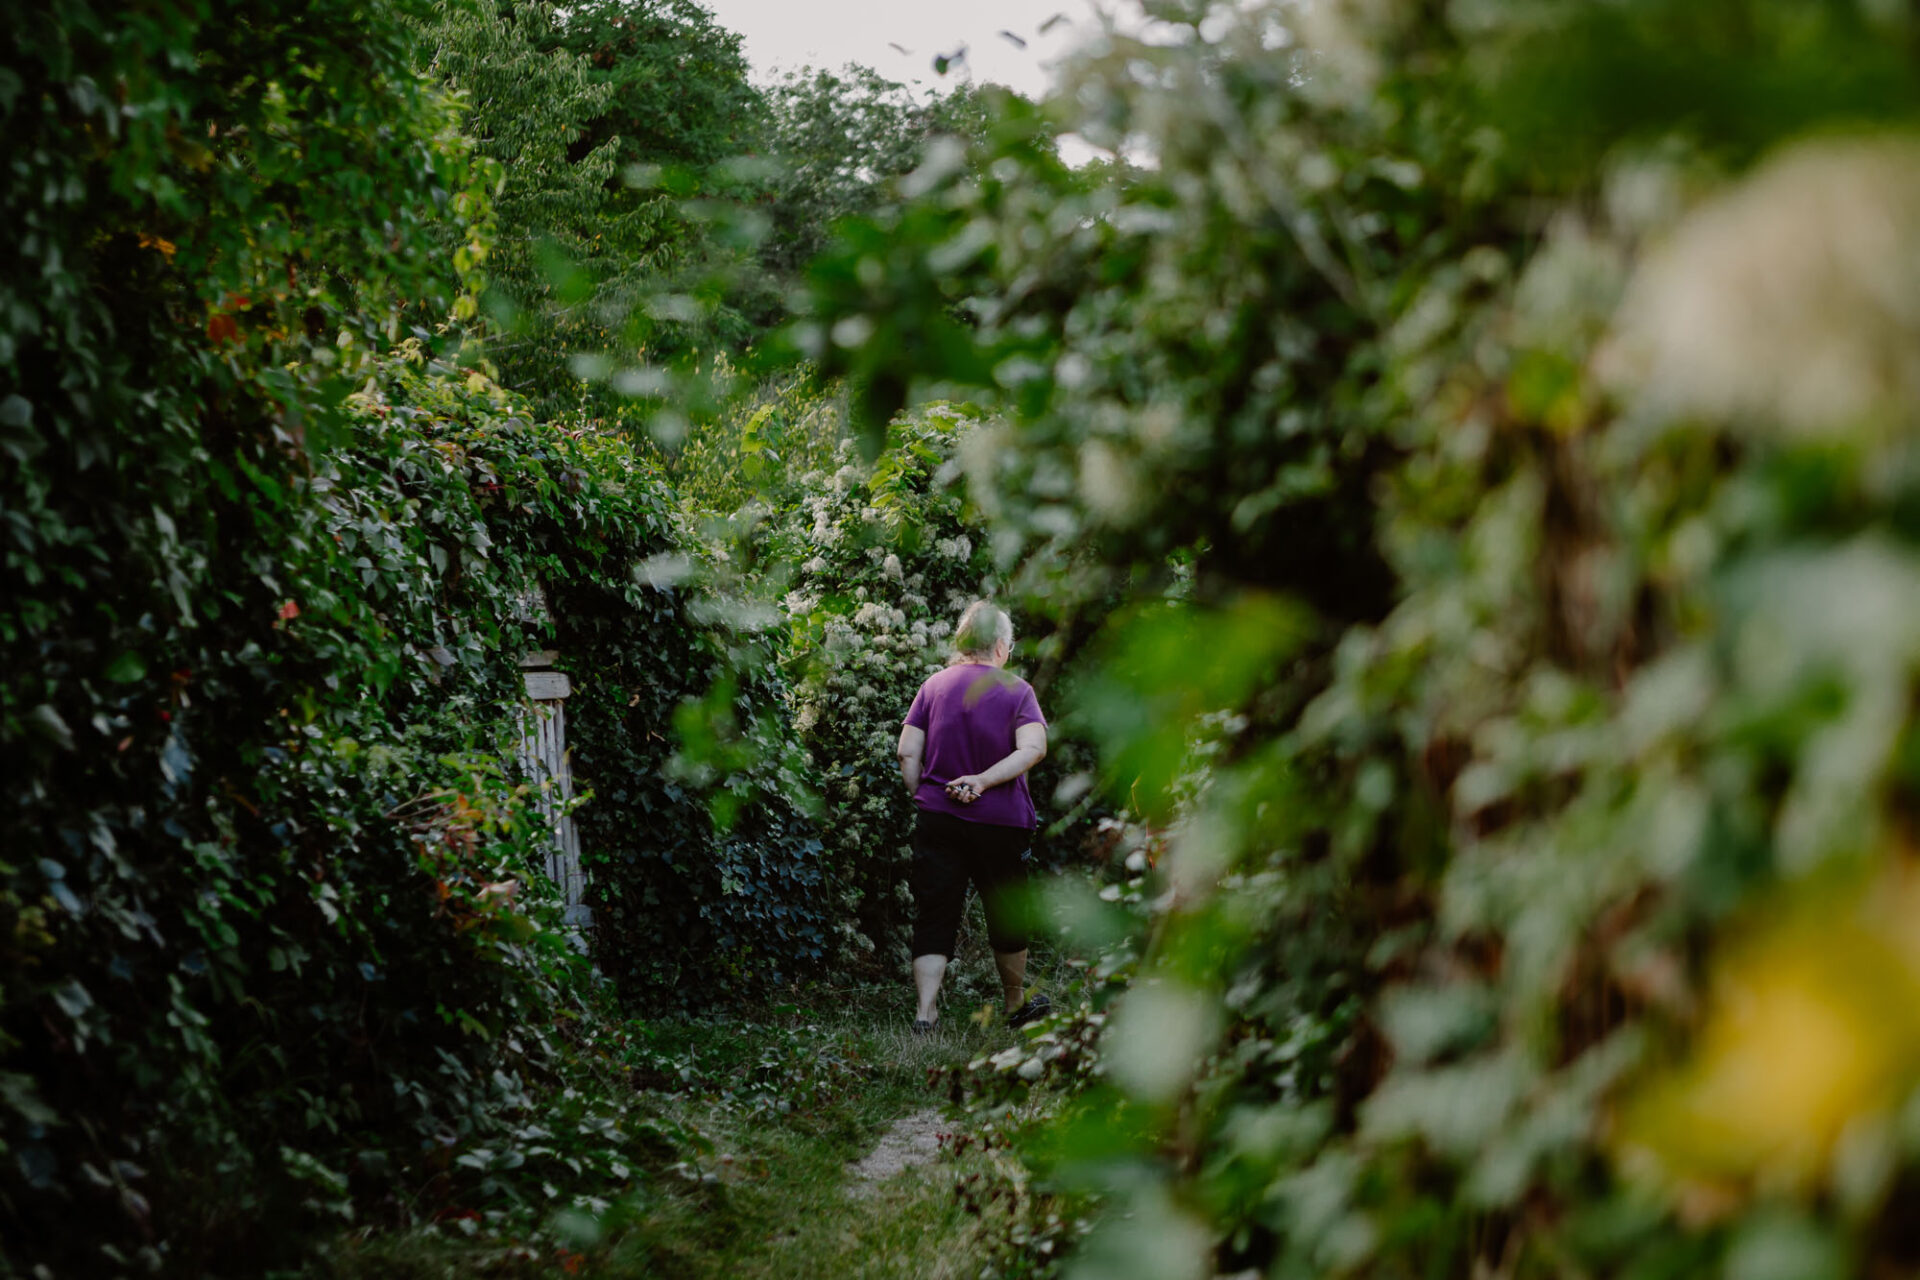 Jardins ouvriers aubervilliers 4 - Dagmara Bojenko - Eco-conscious Weddings, Births & Families